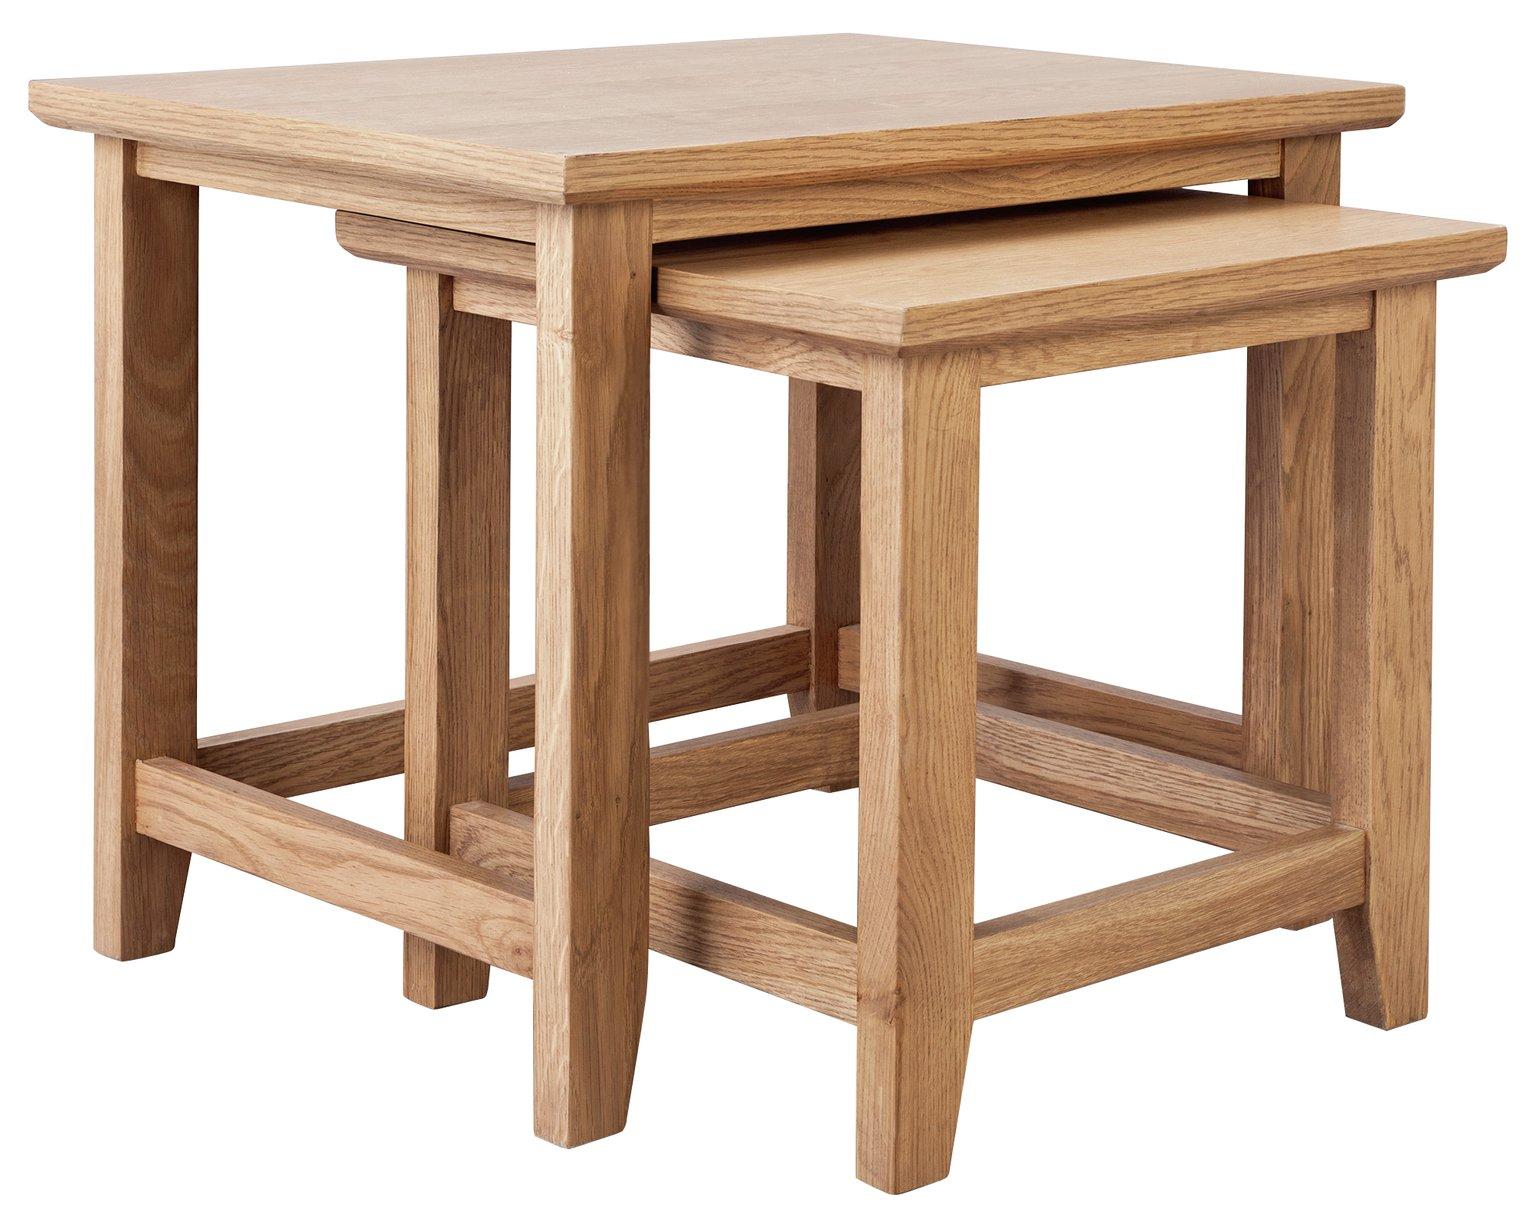 Argos Home Islington Nest of 2 Oak Veneer Tables